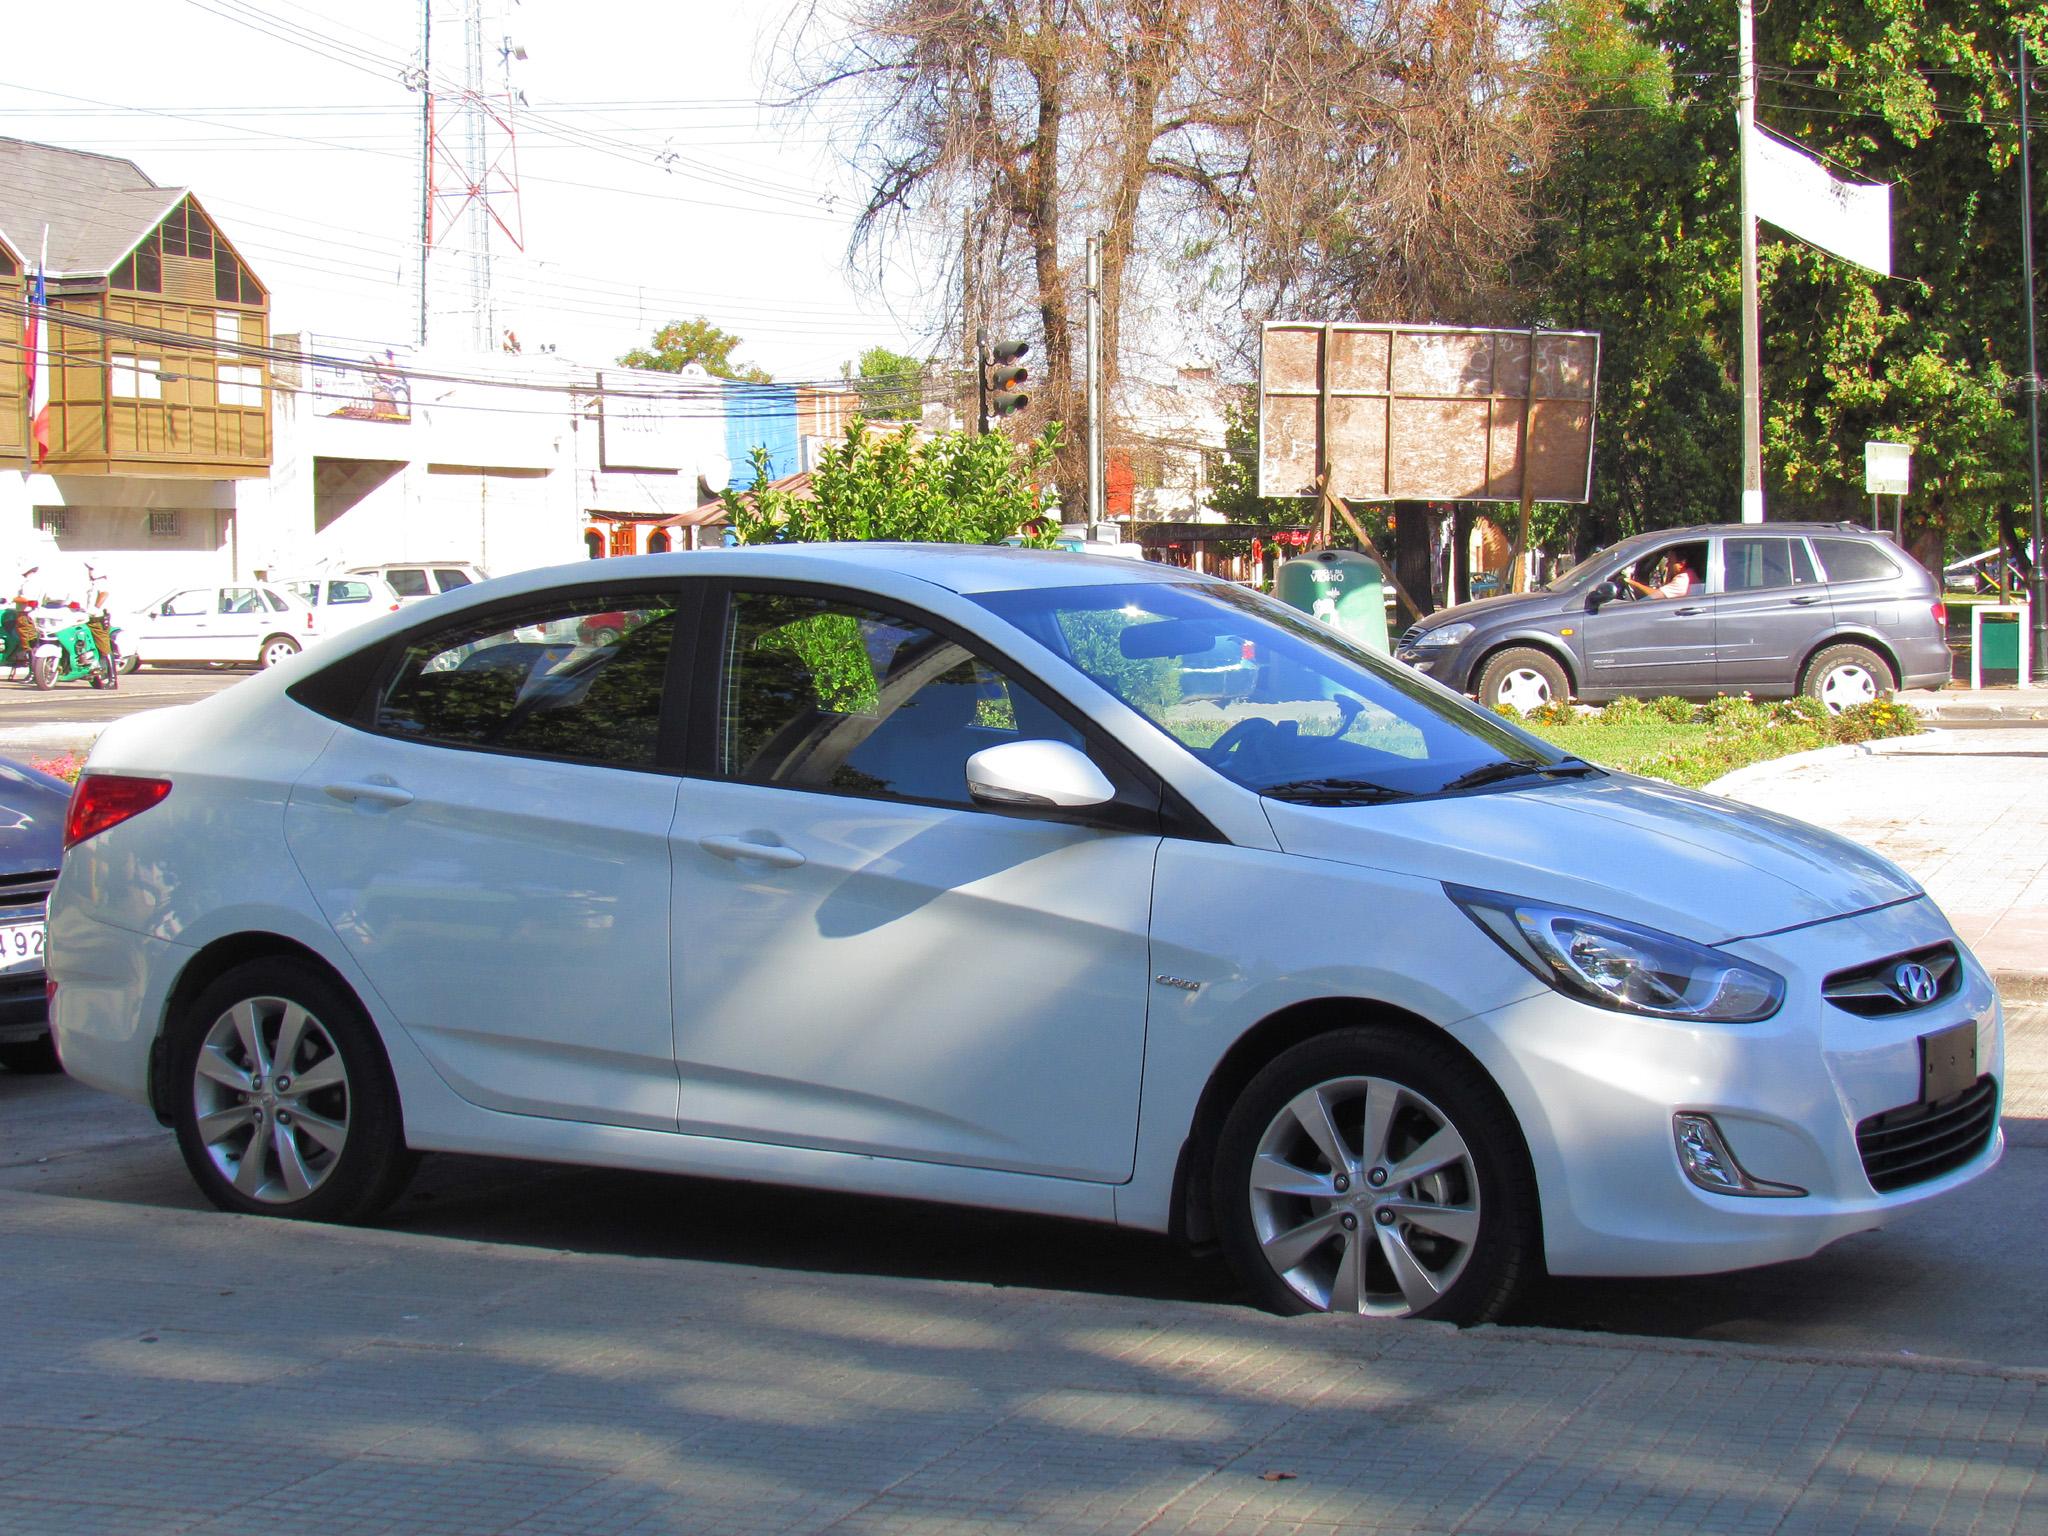 Delightful File:Hyundai Accent GLS 1.6 CRDi 2013 (9714319958)